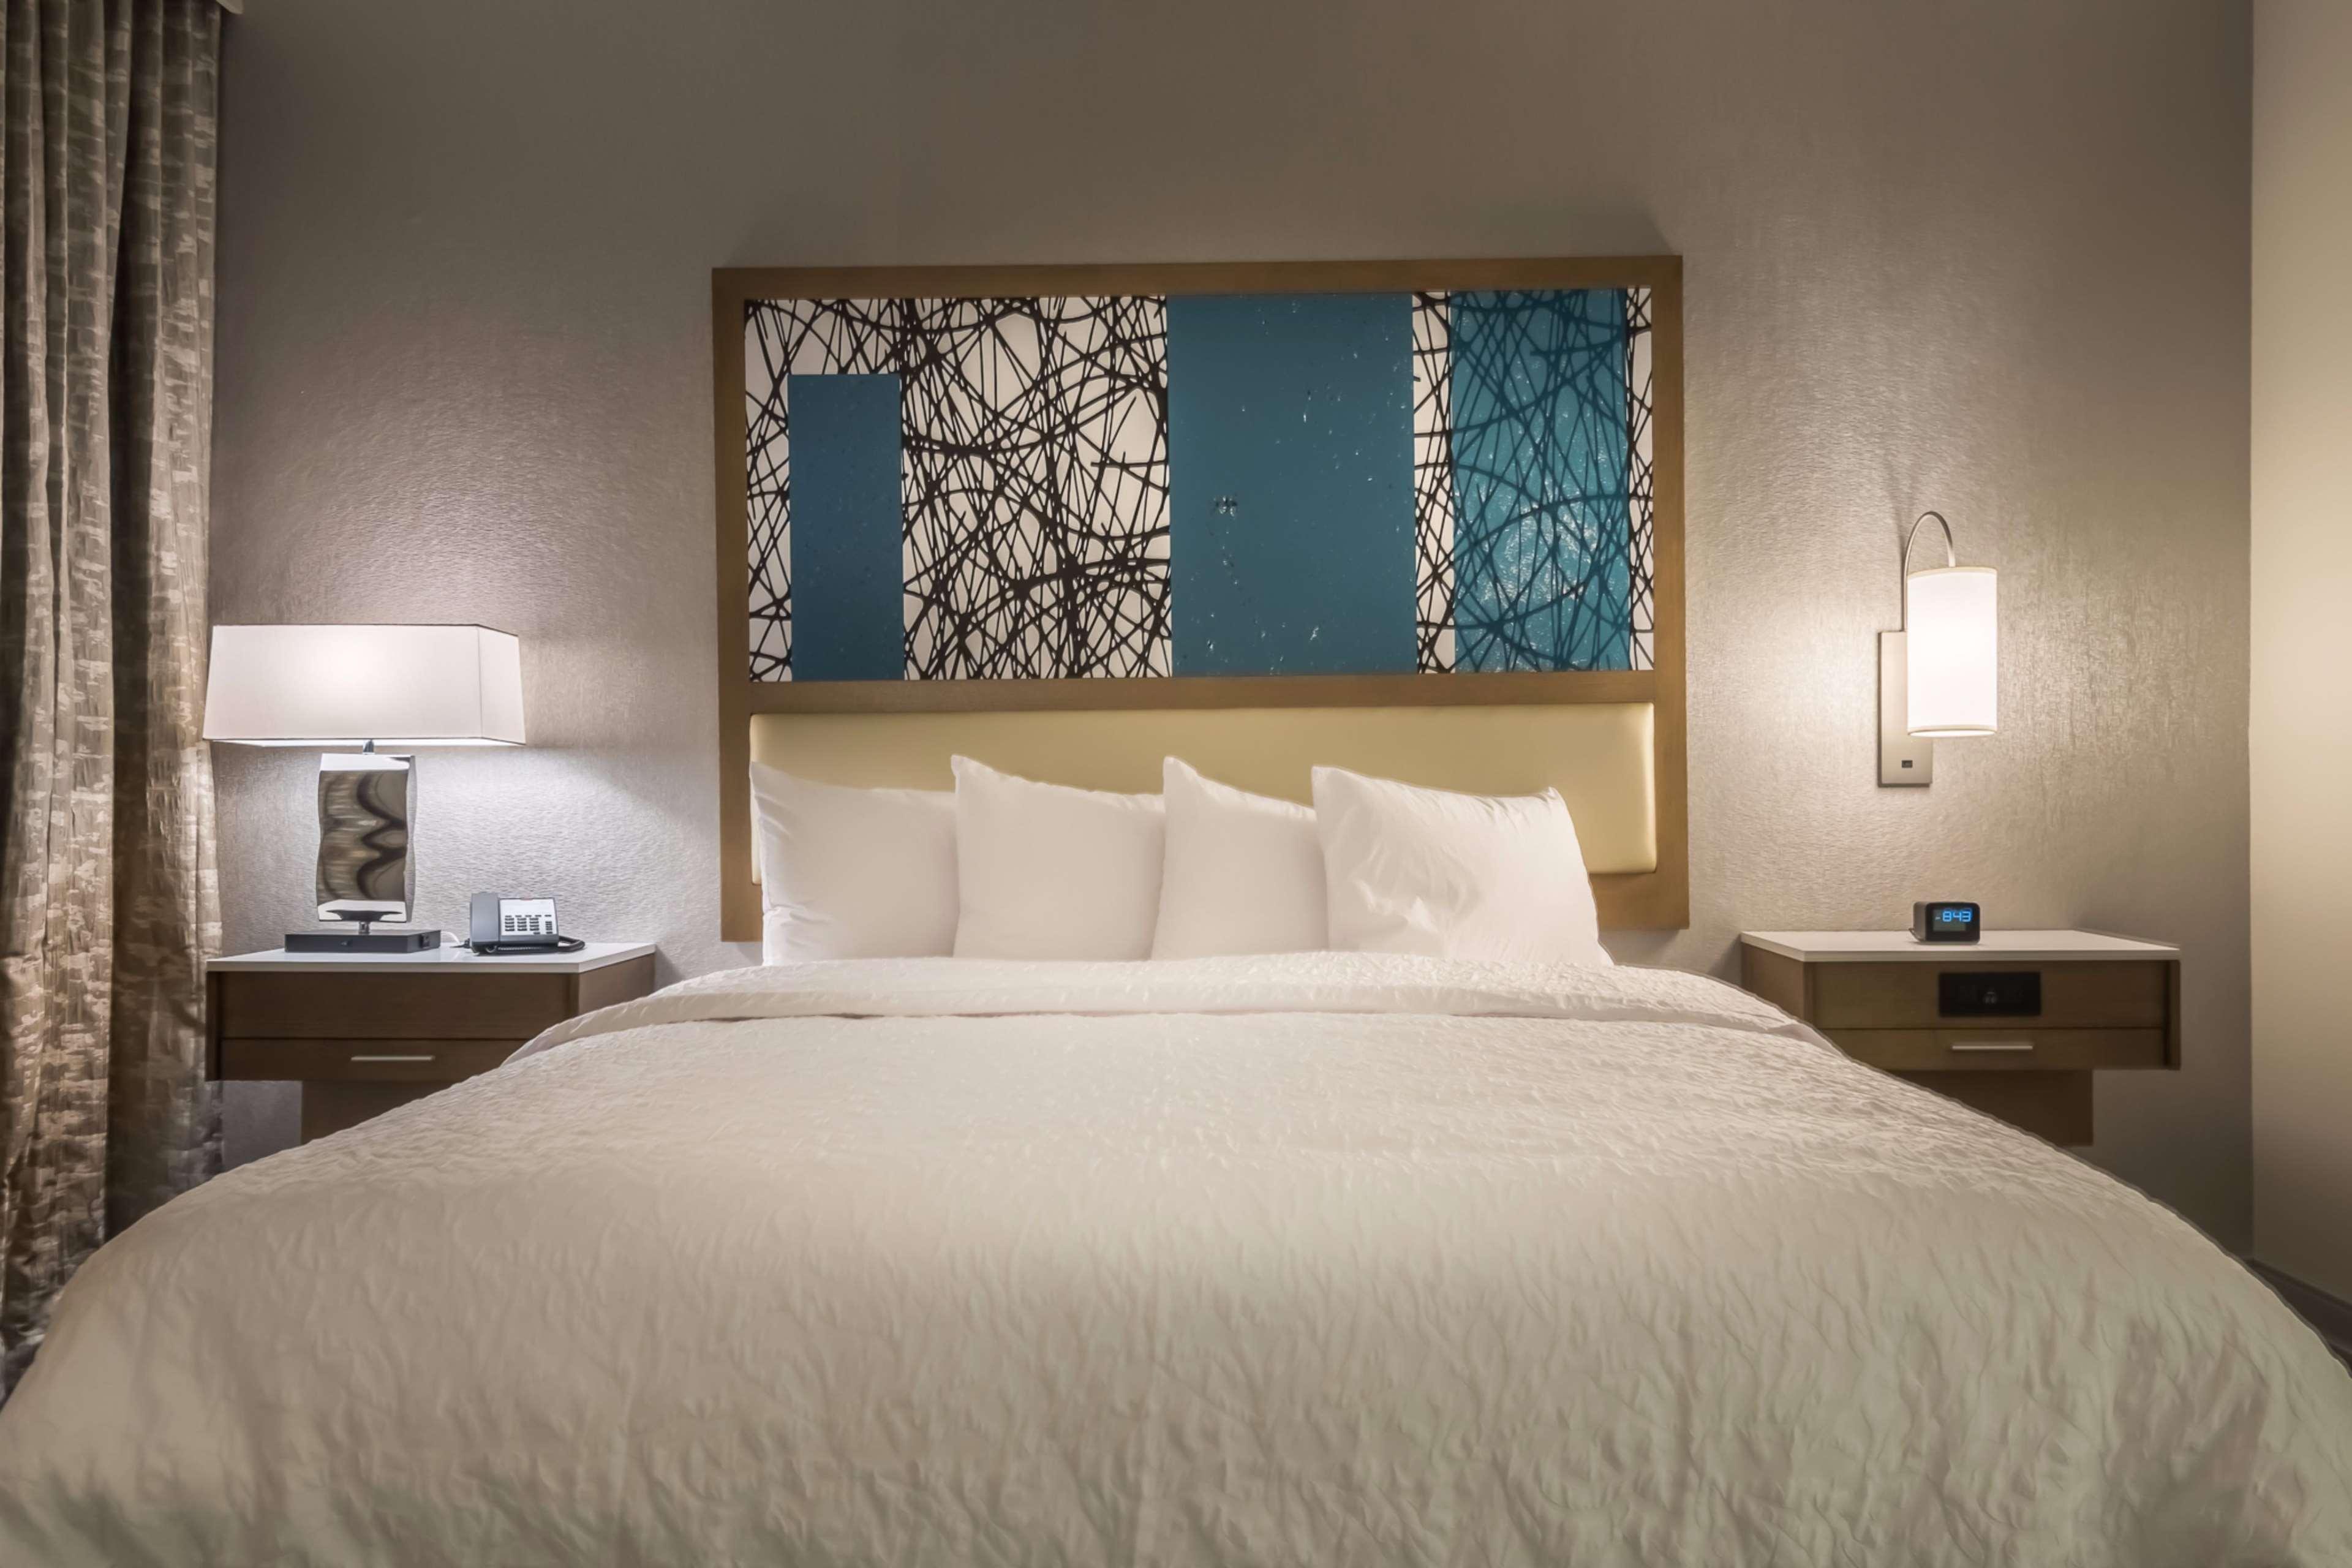 Hampton Inn & Suites Dallas-The Colony, TX image 17